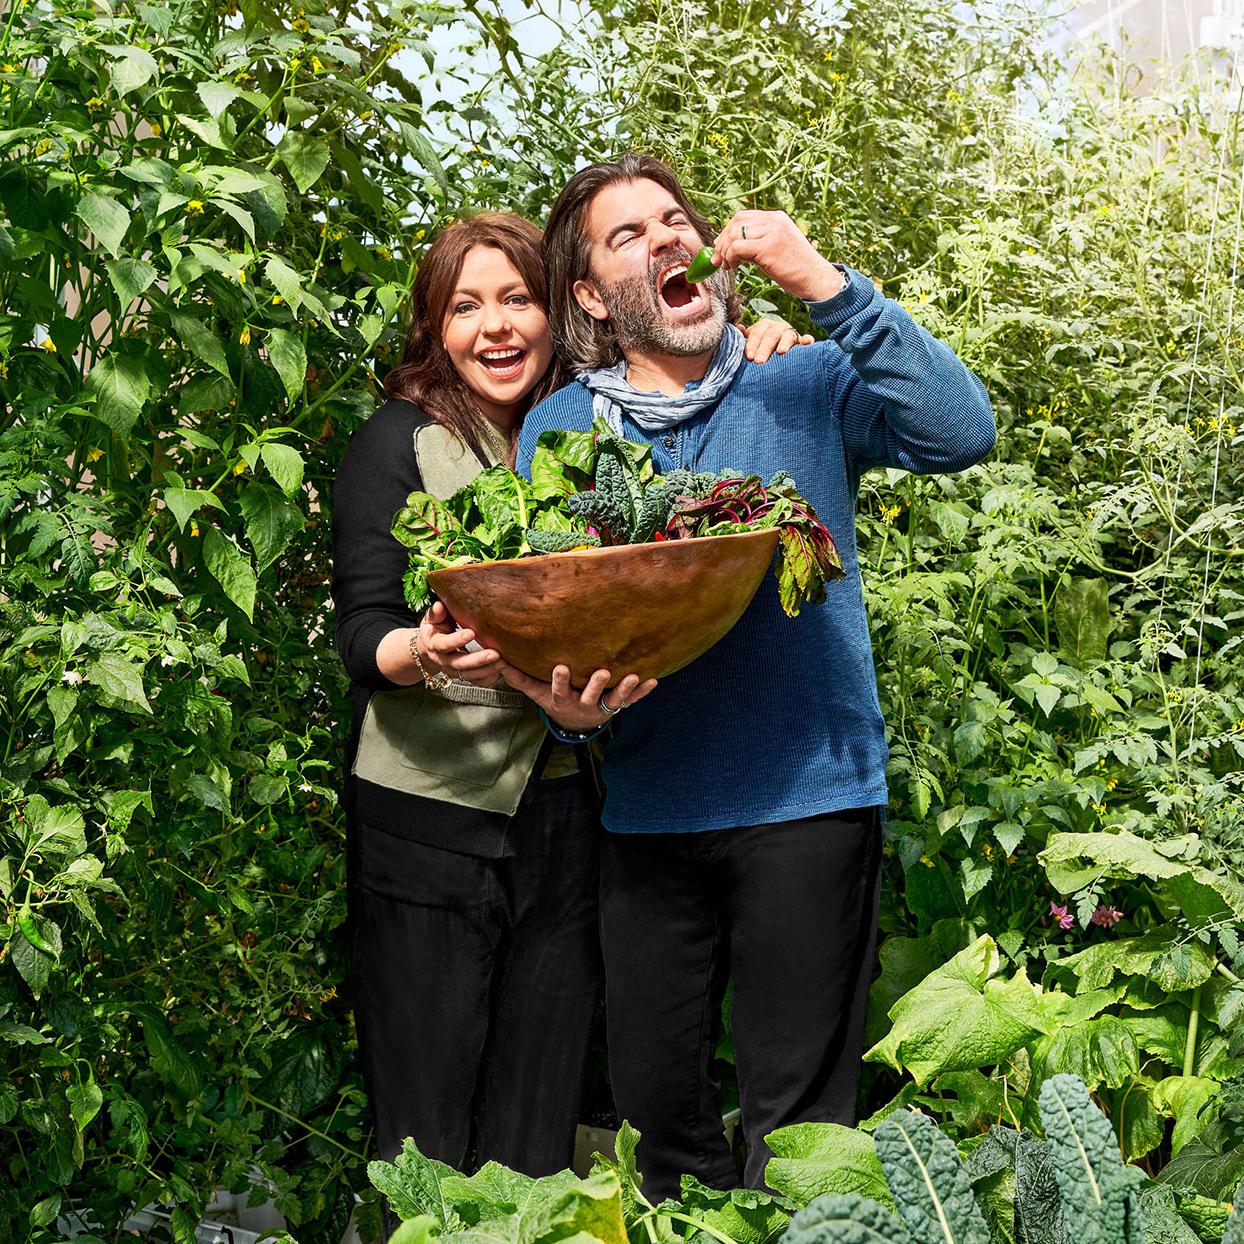 rach and john in vegetable garden